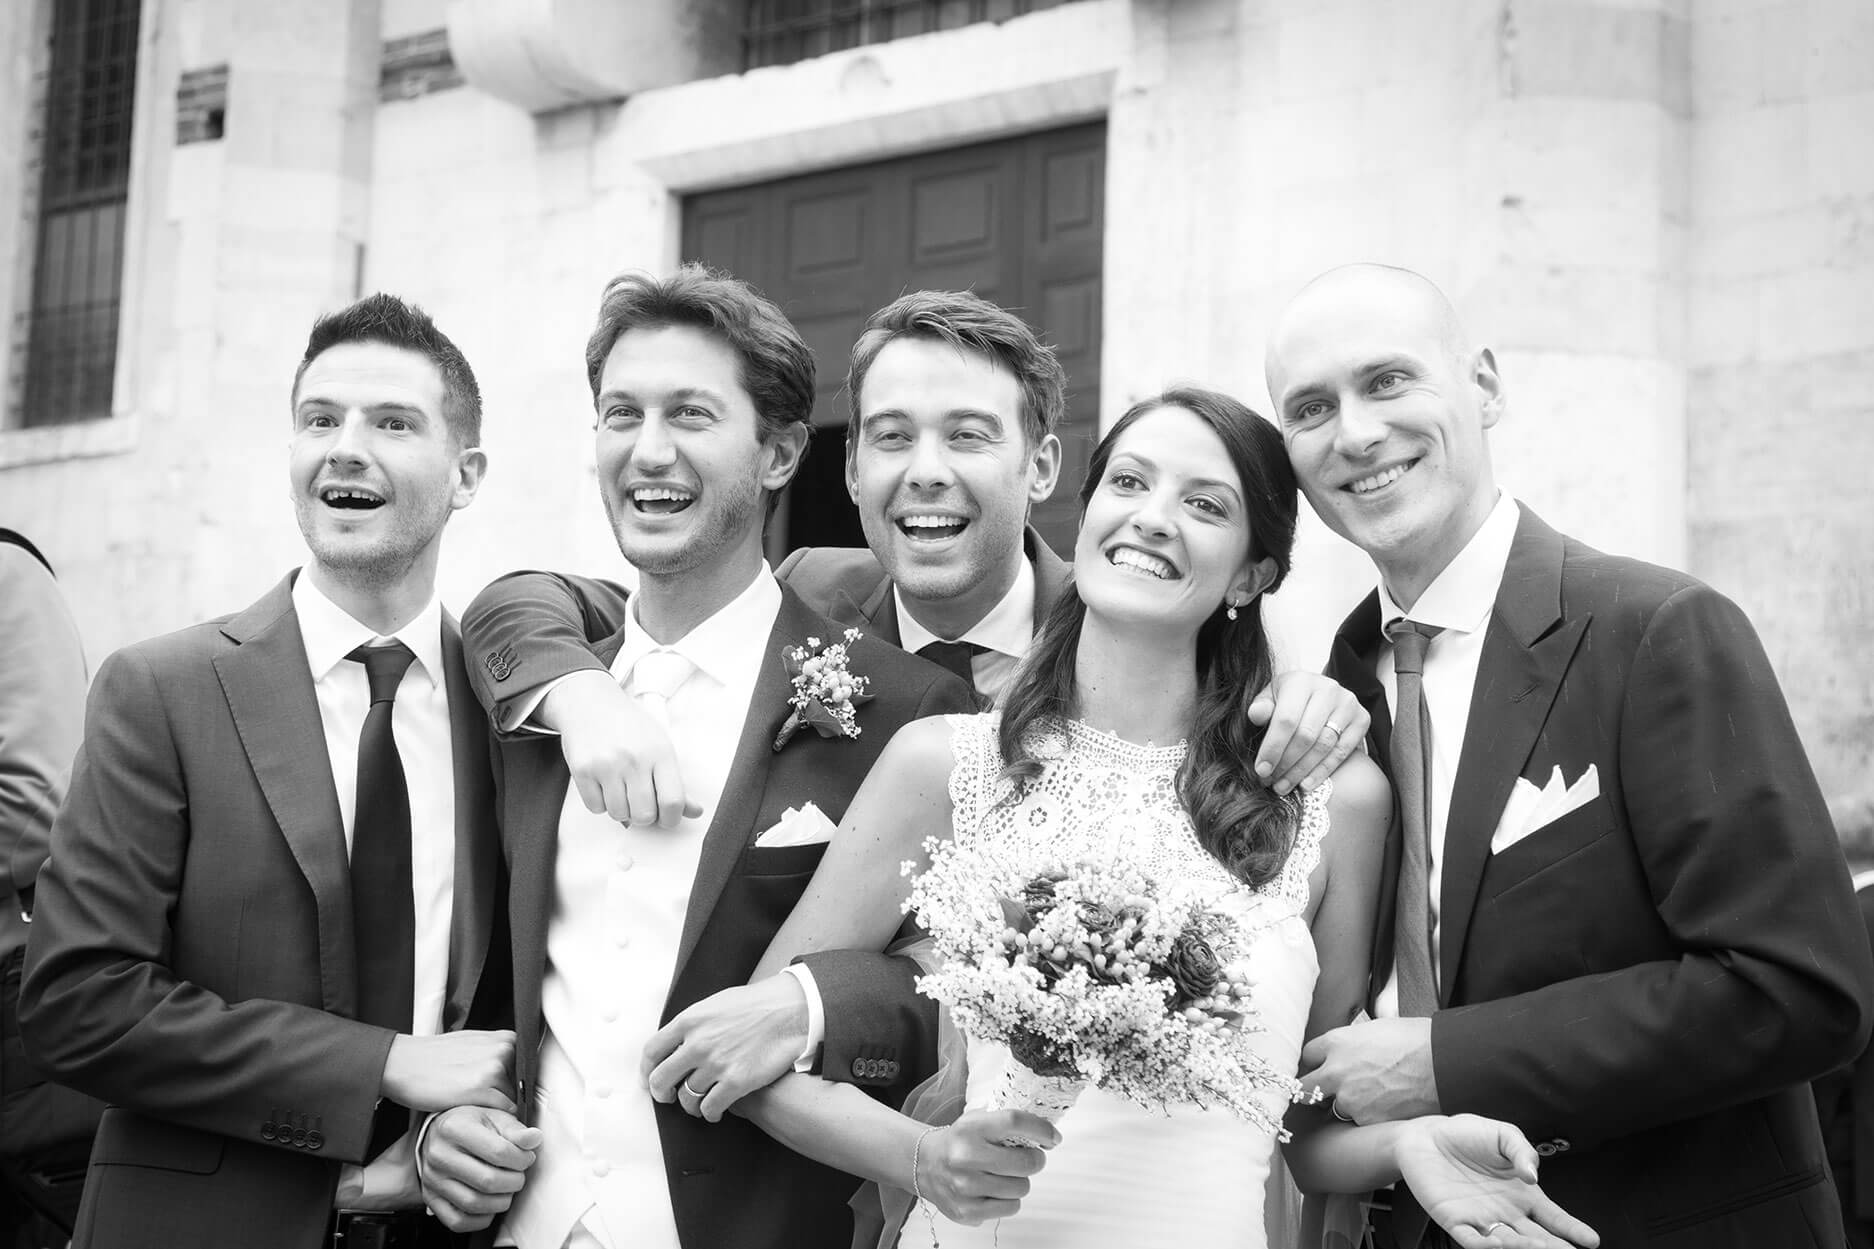 Francesca-Ferrati-WeddingIMG_0930